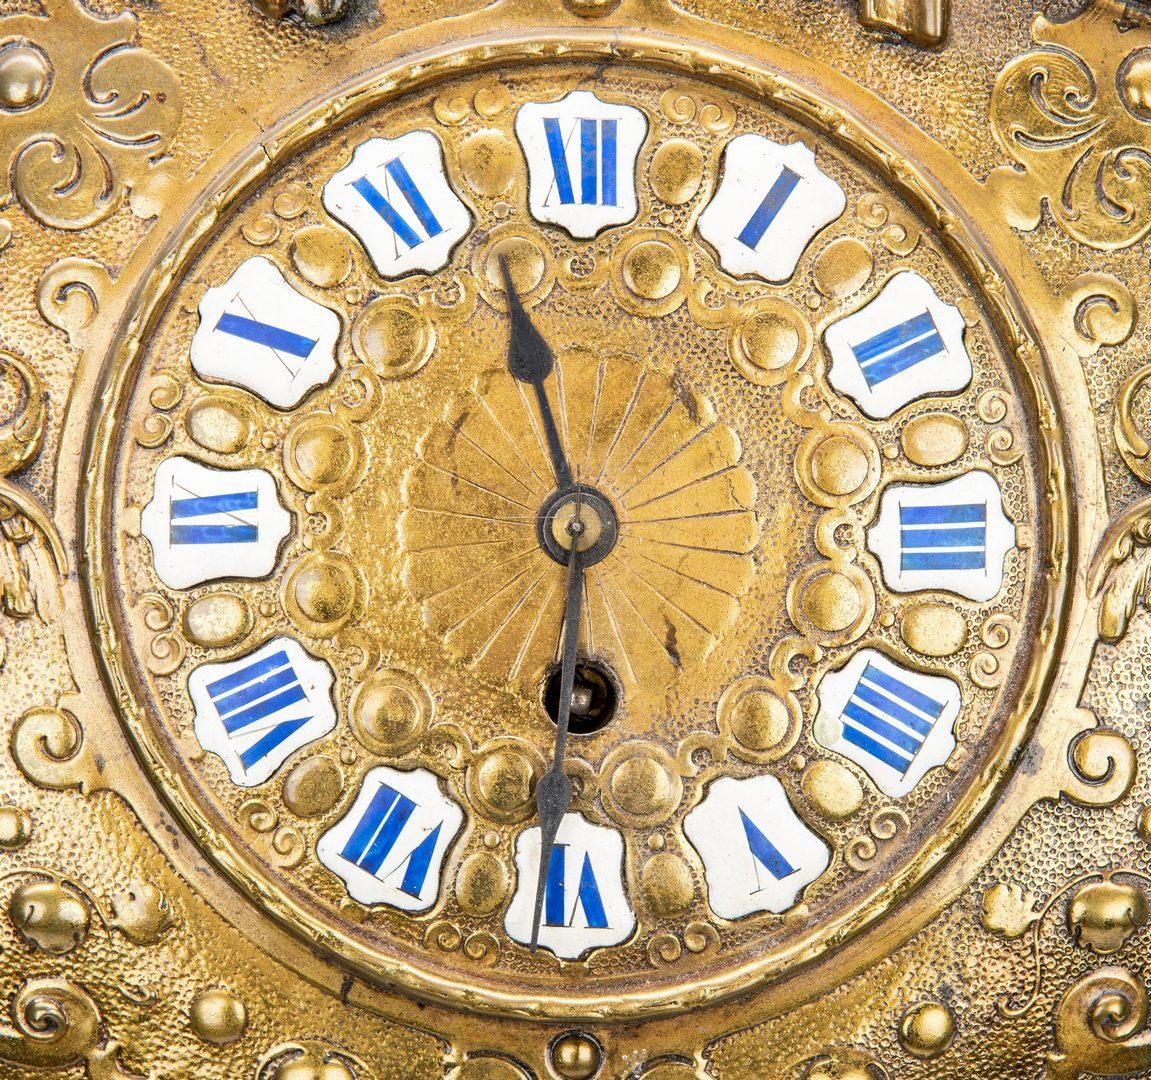 Lot 154: Gustav Becker German Ormolu Wall Clock